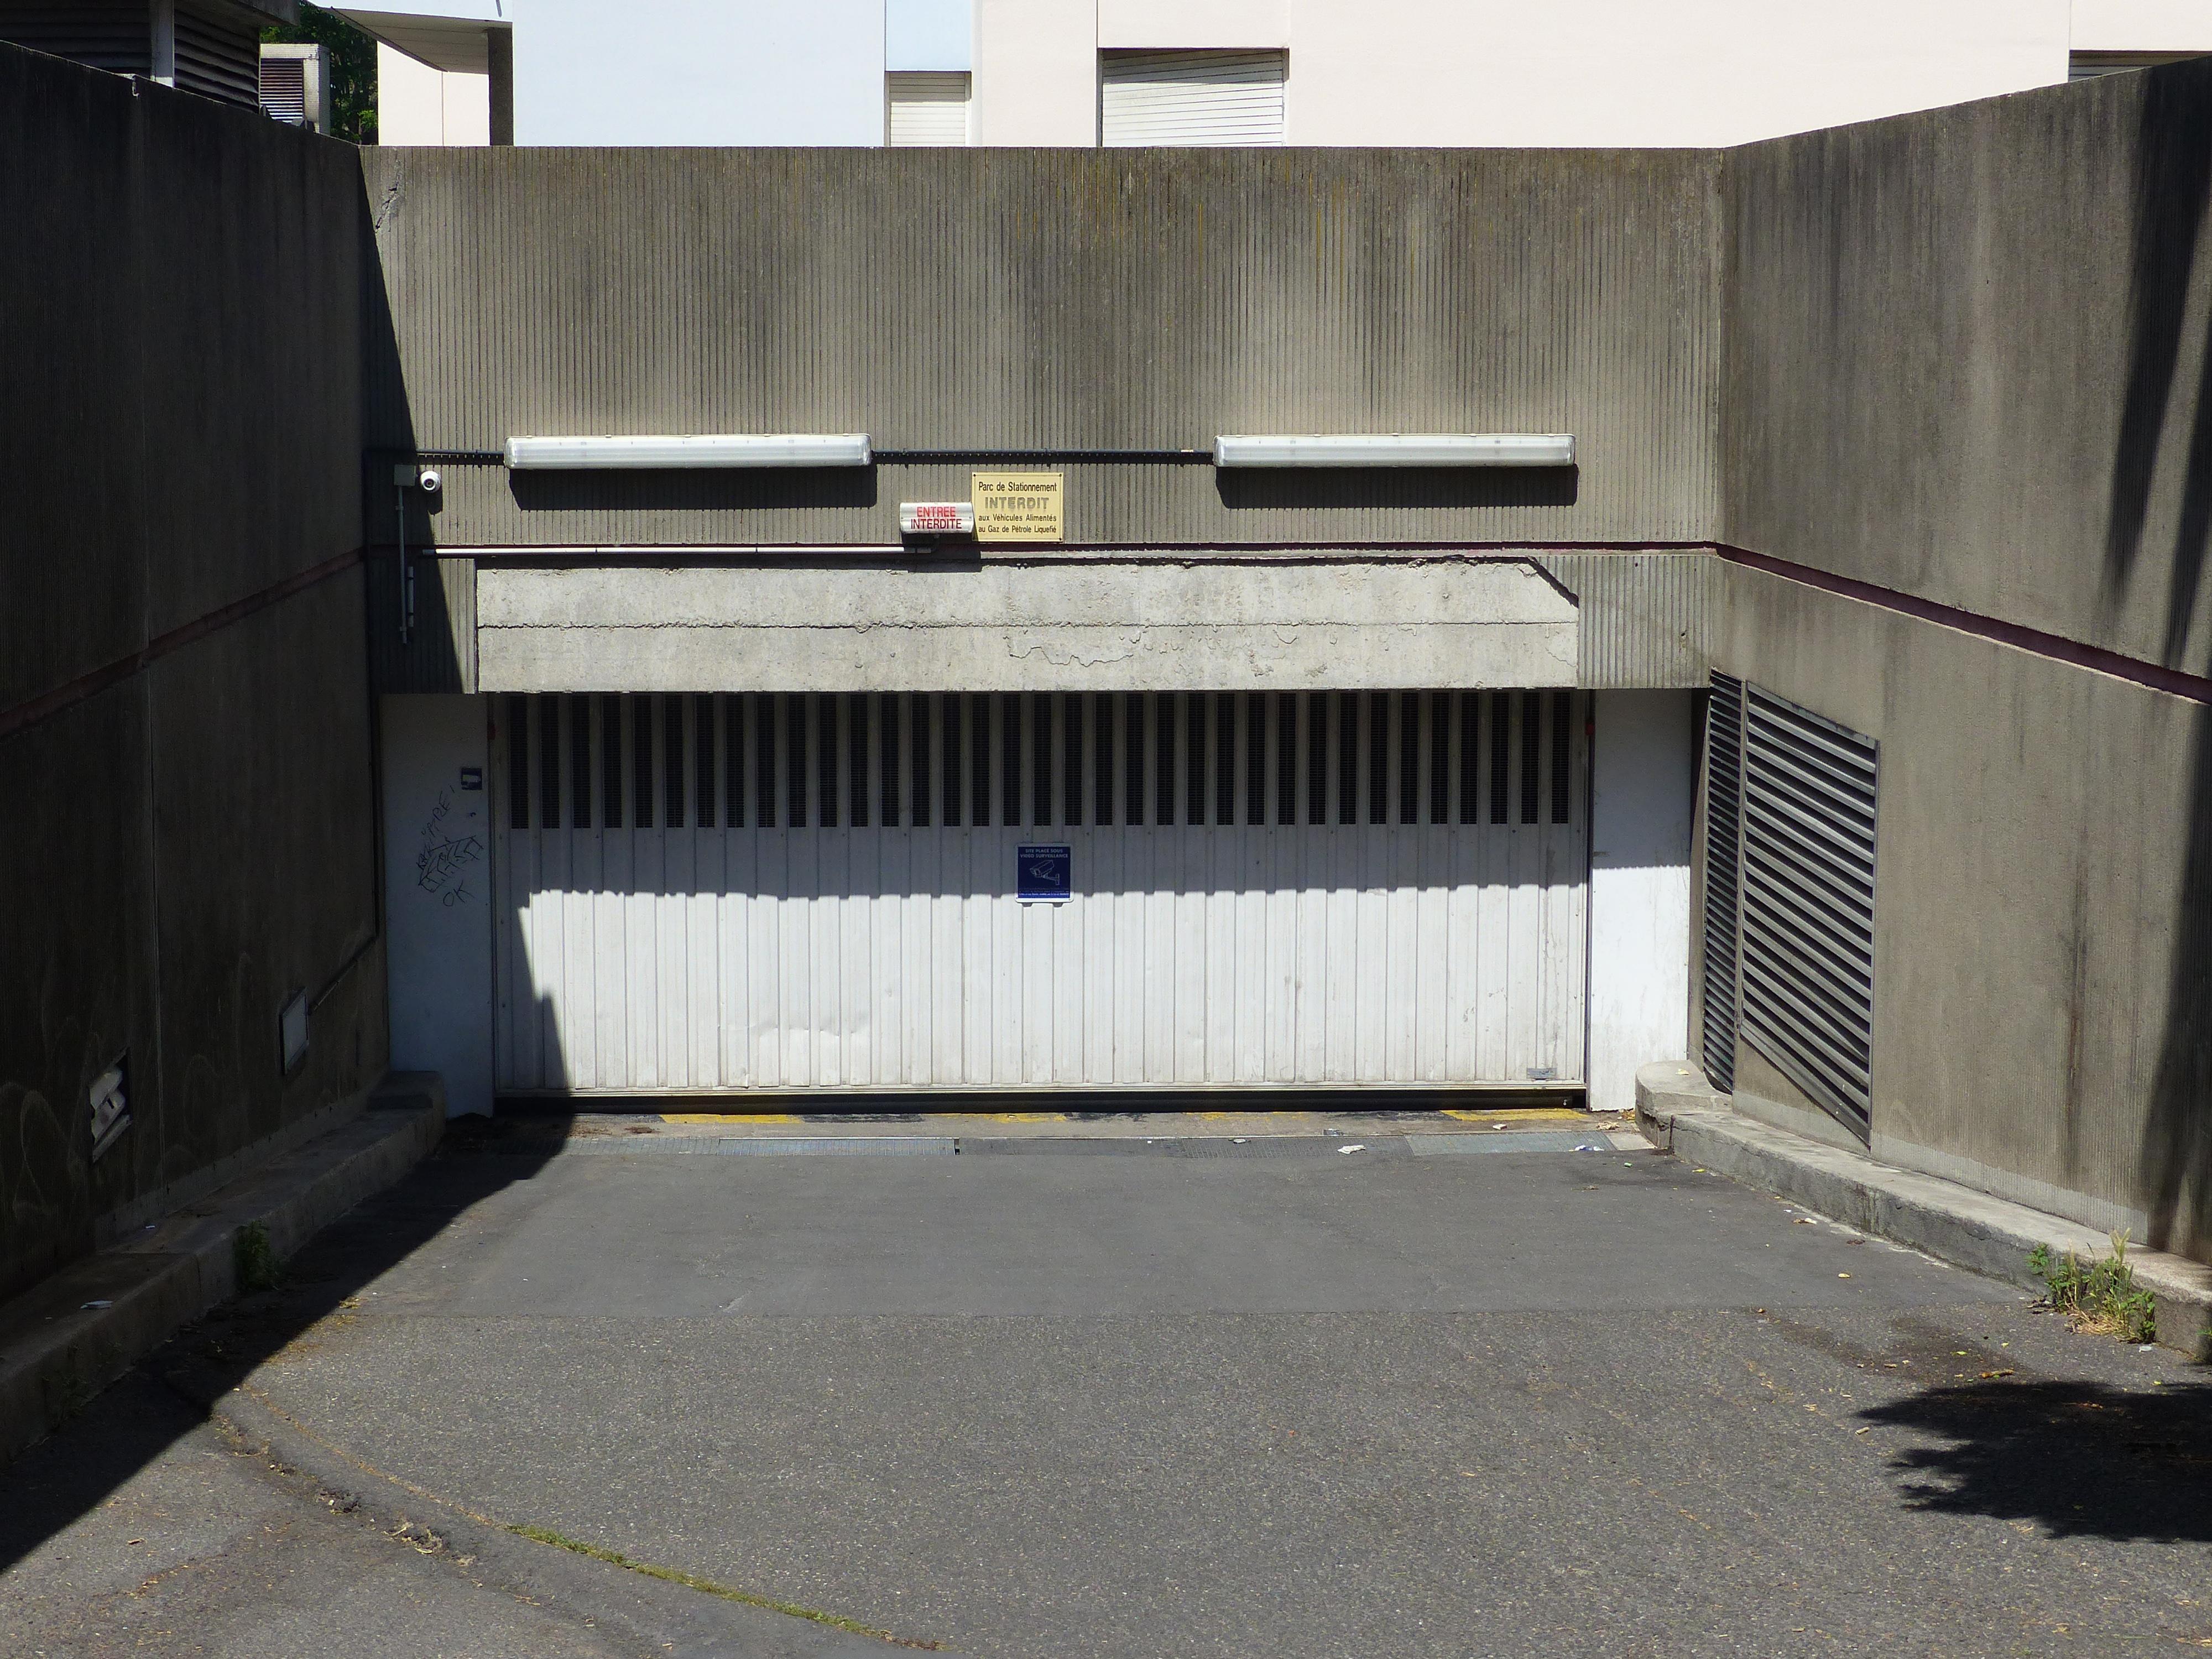 Valopark - Location Box/parking Garde Meuble Paris